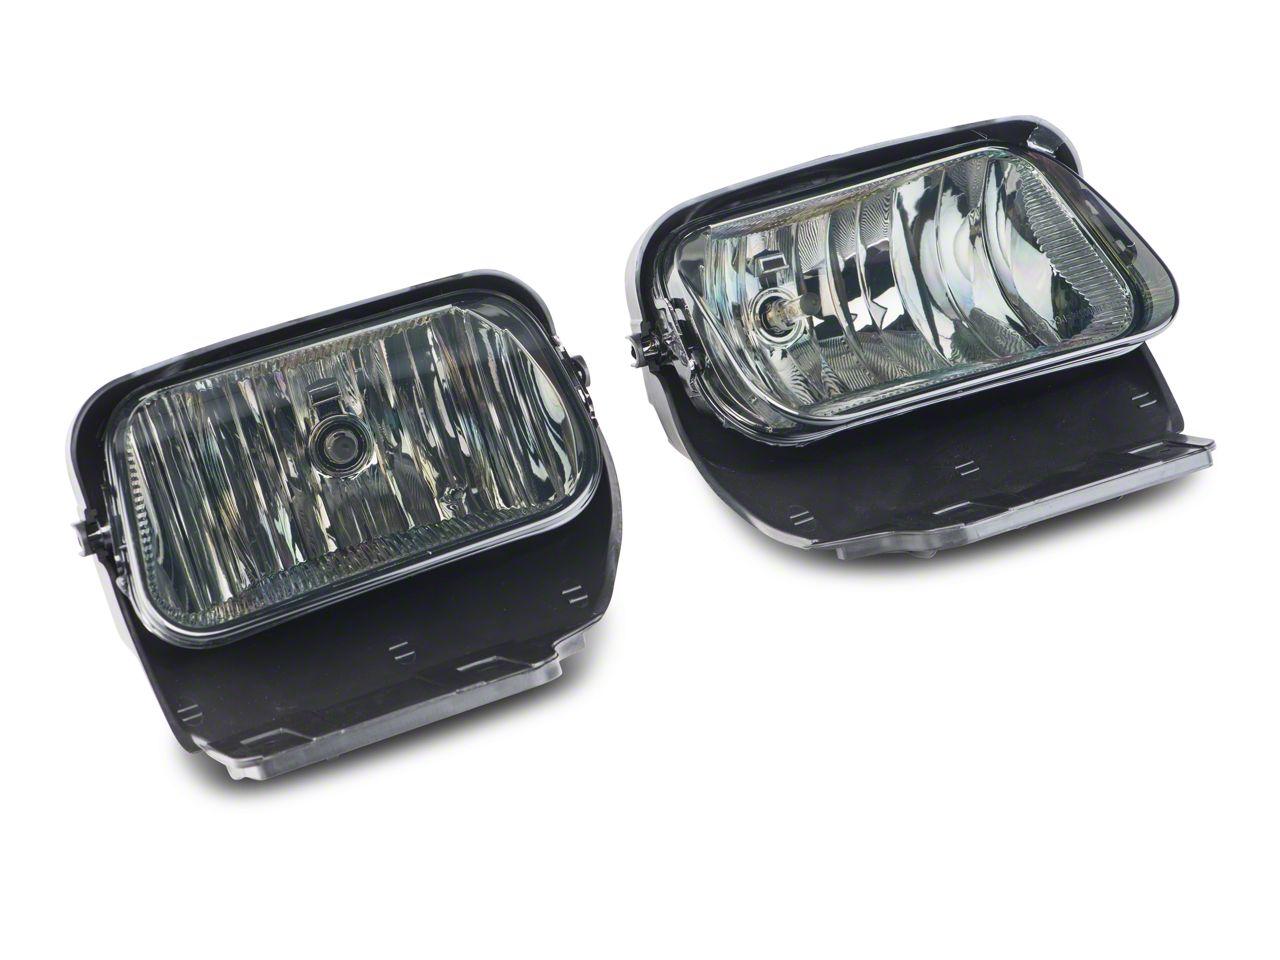 Axial Smoked OE Style Fog Lights - Pair (03-06 Silverado 1500)